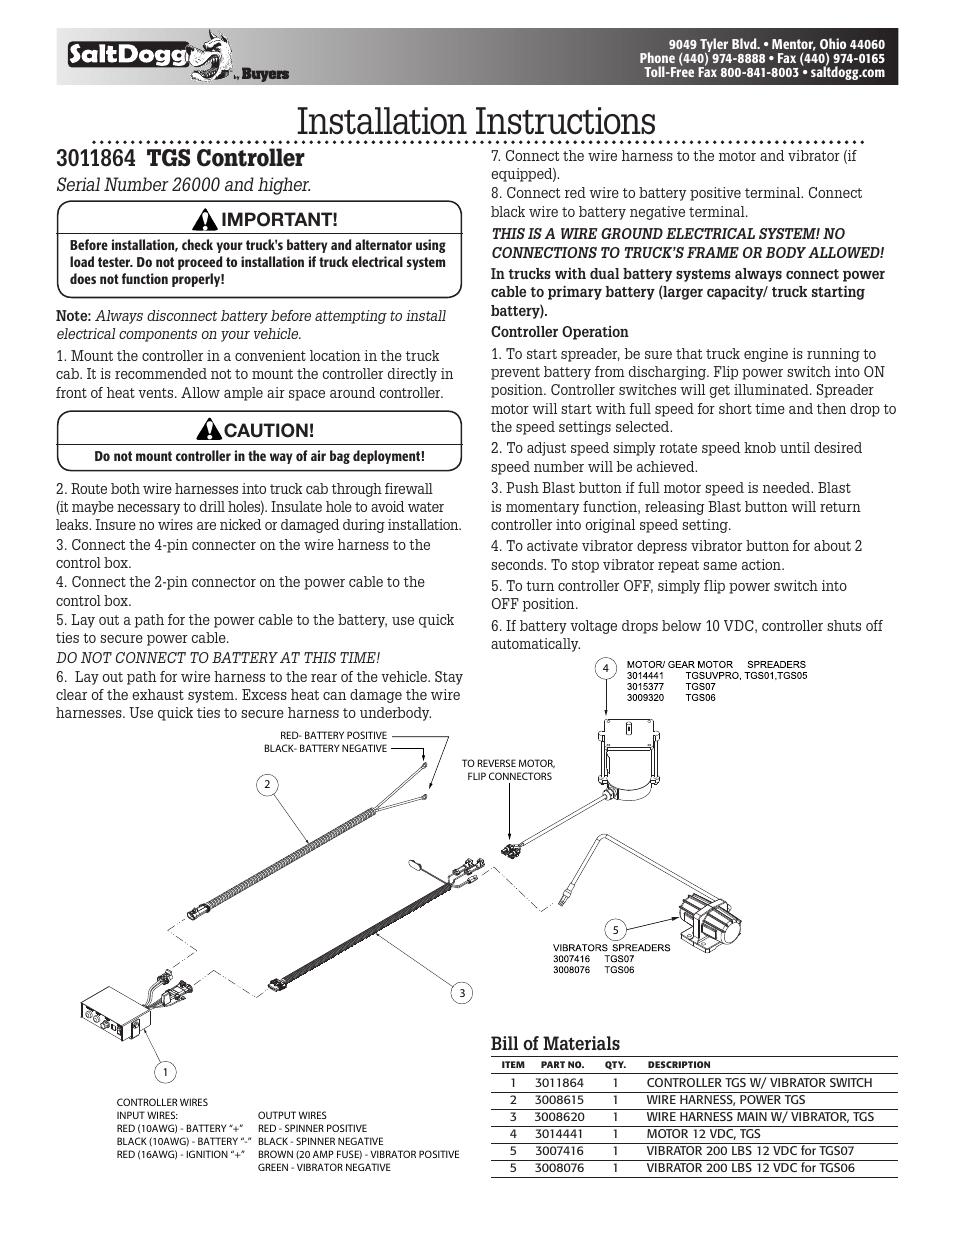 hight resolution of saltdogg tgs controller 3011864 tgsuvproa tgs01b tgs03 tgs05b western spreader wiring schematic salt dogg wiring diagram